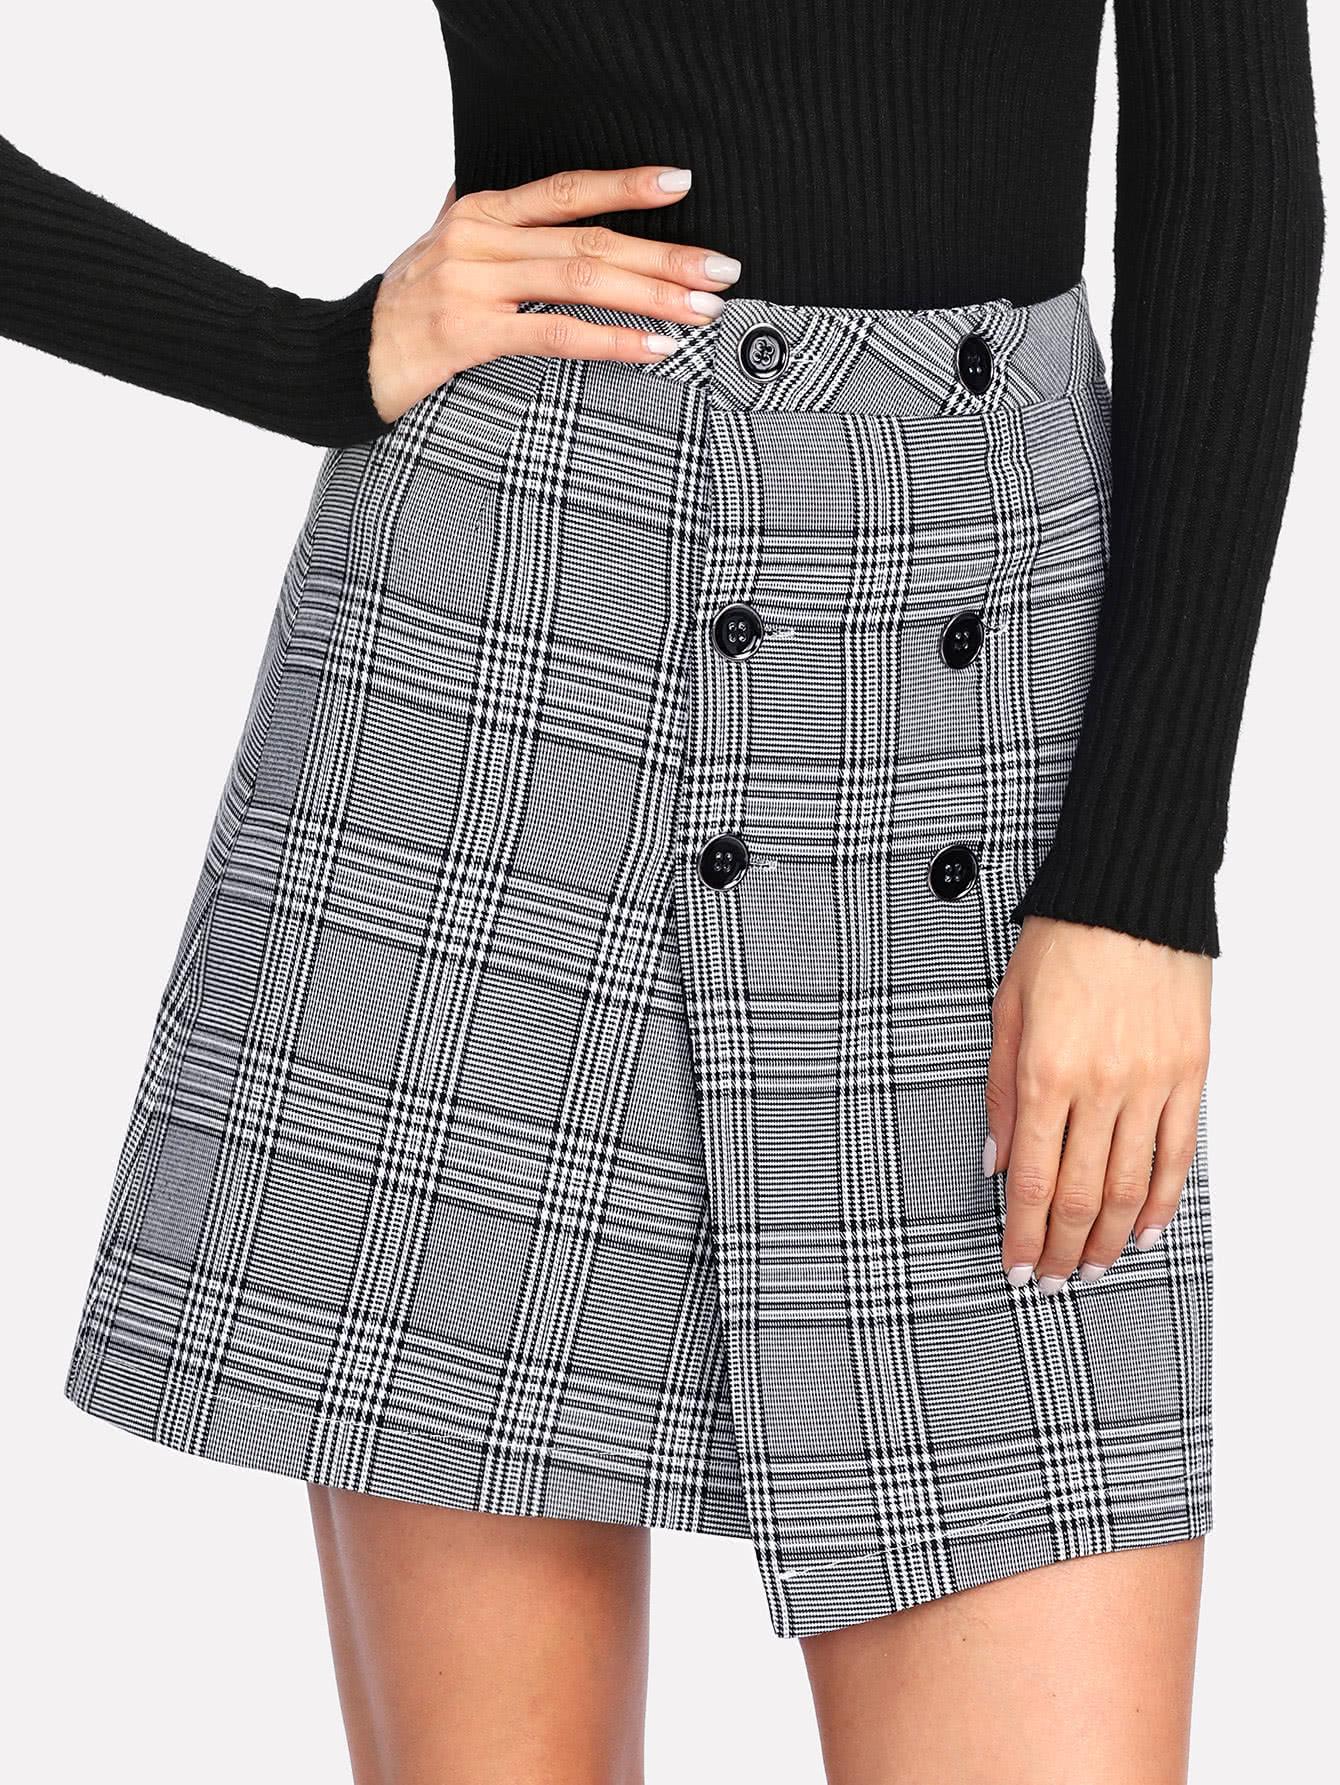 Wales Check Overlap Skirt split front wales check skirt